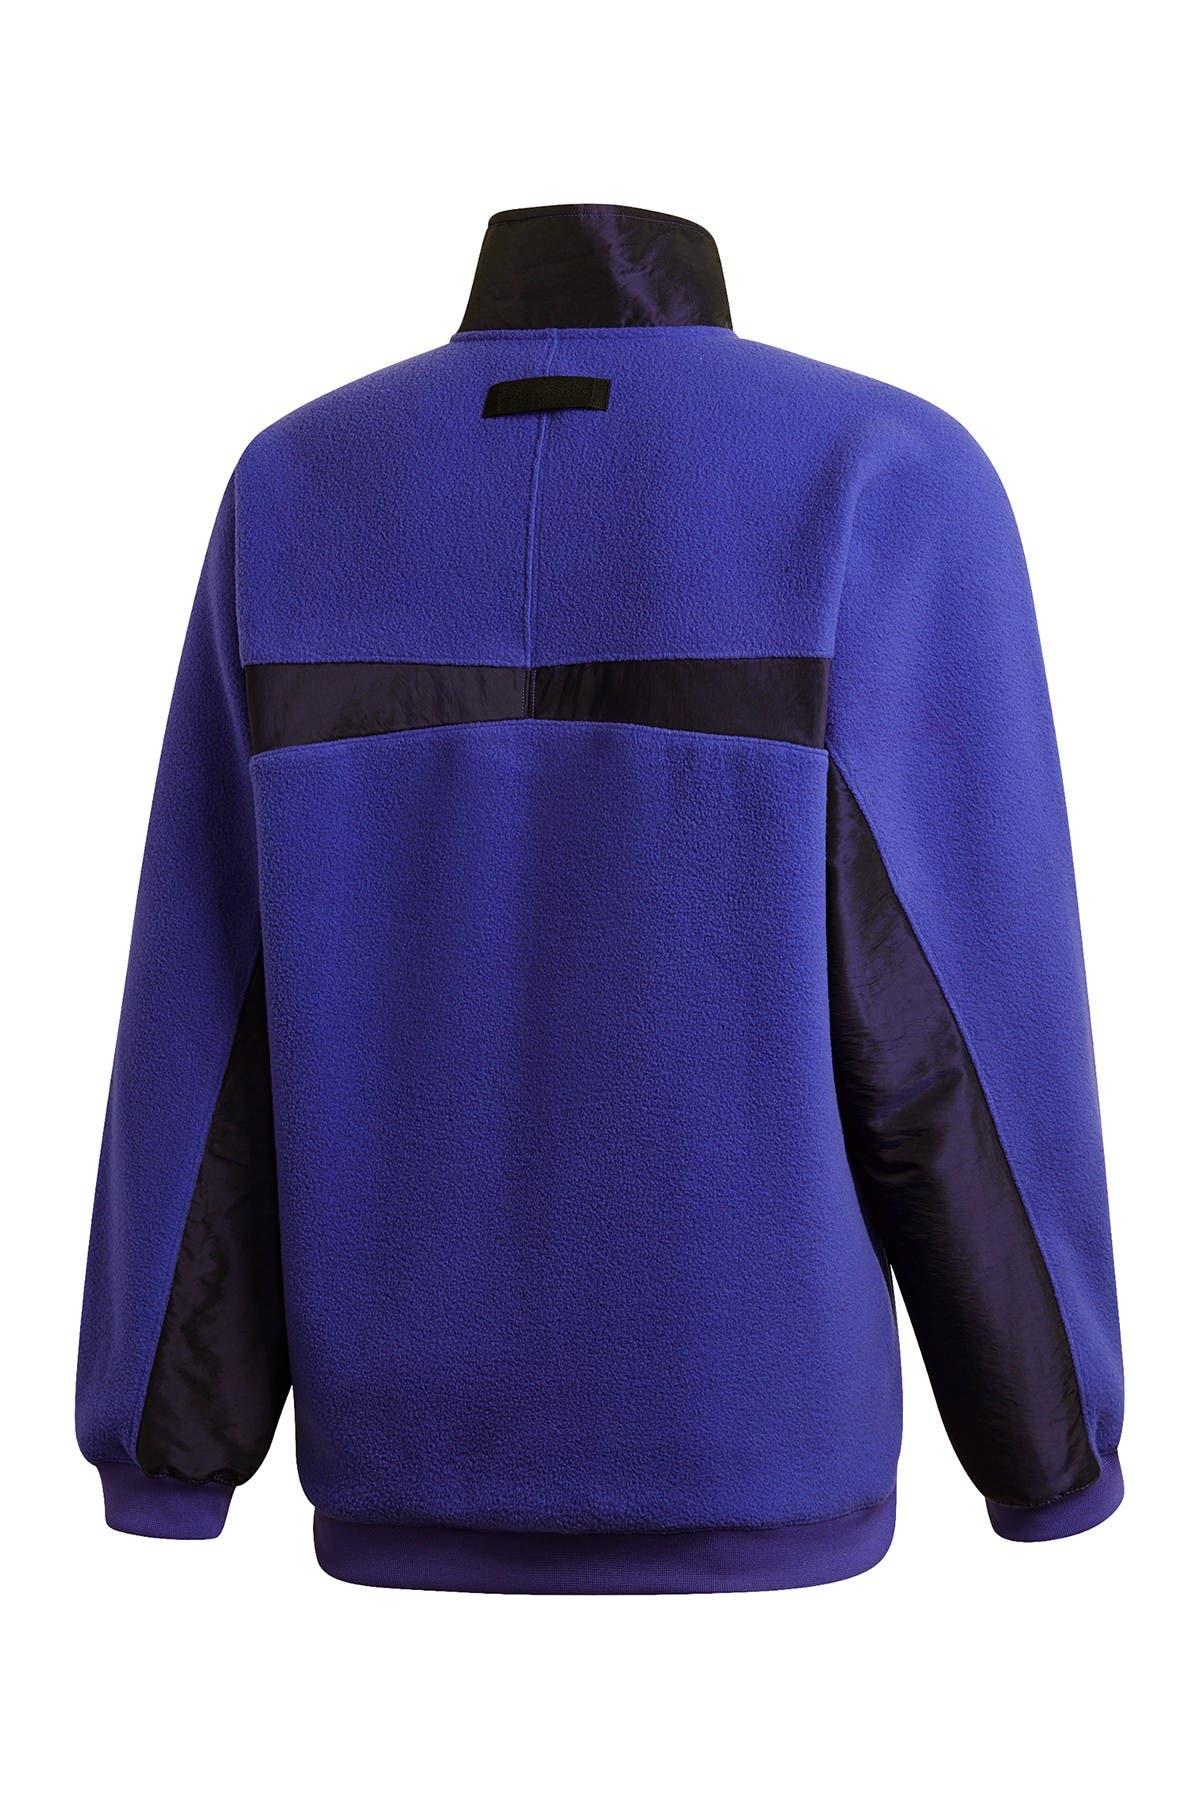 Image of adidas D Sweatshirt